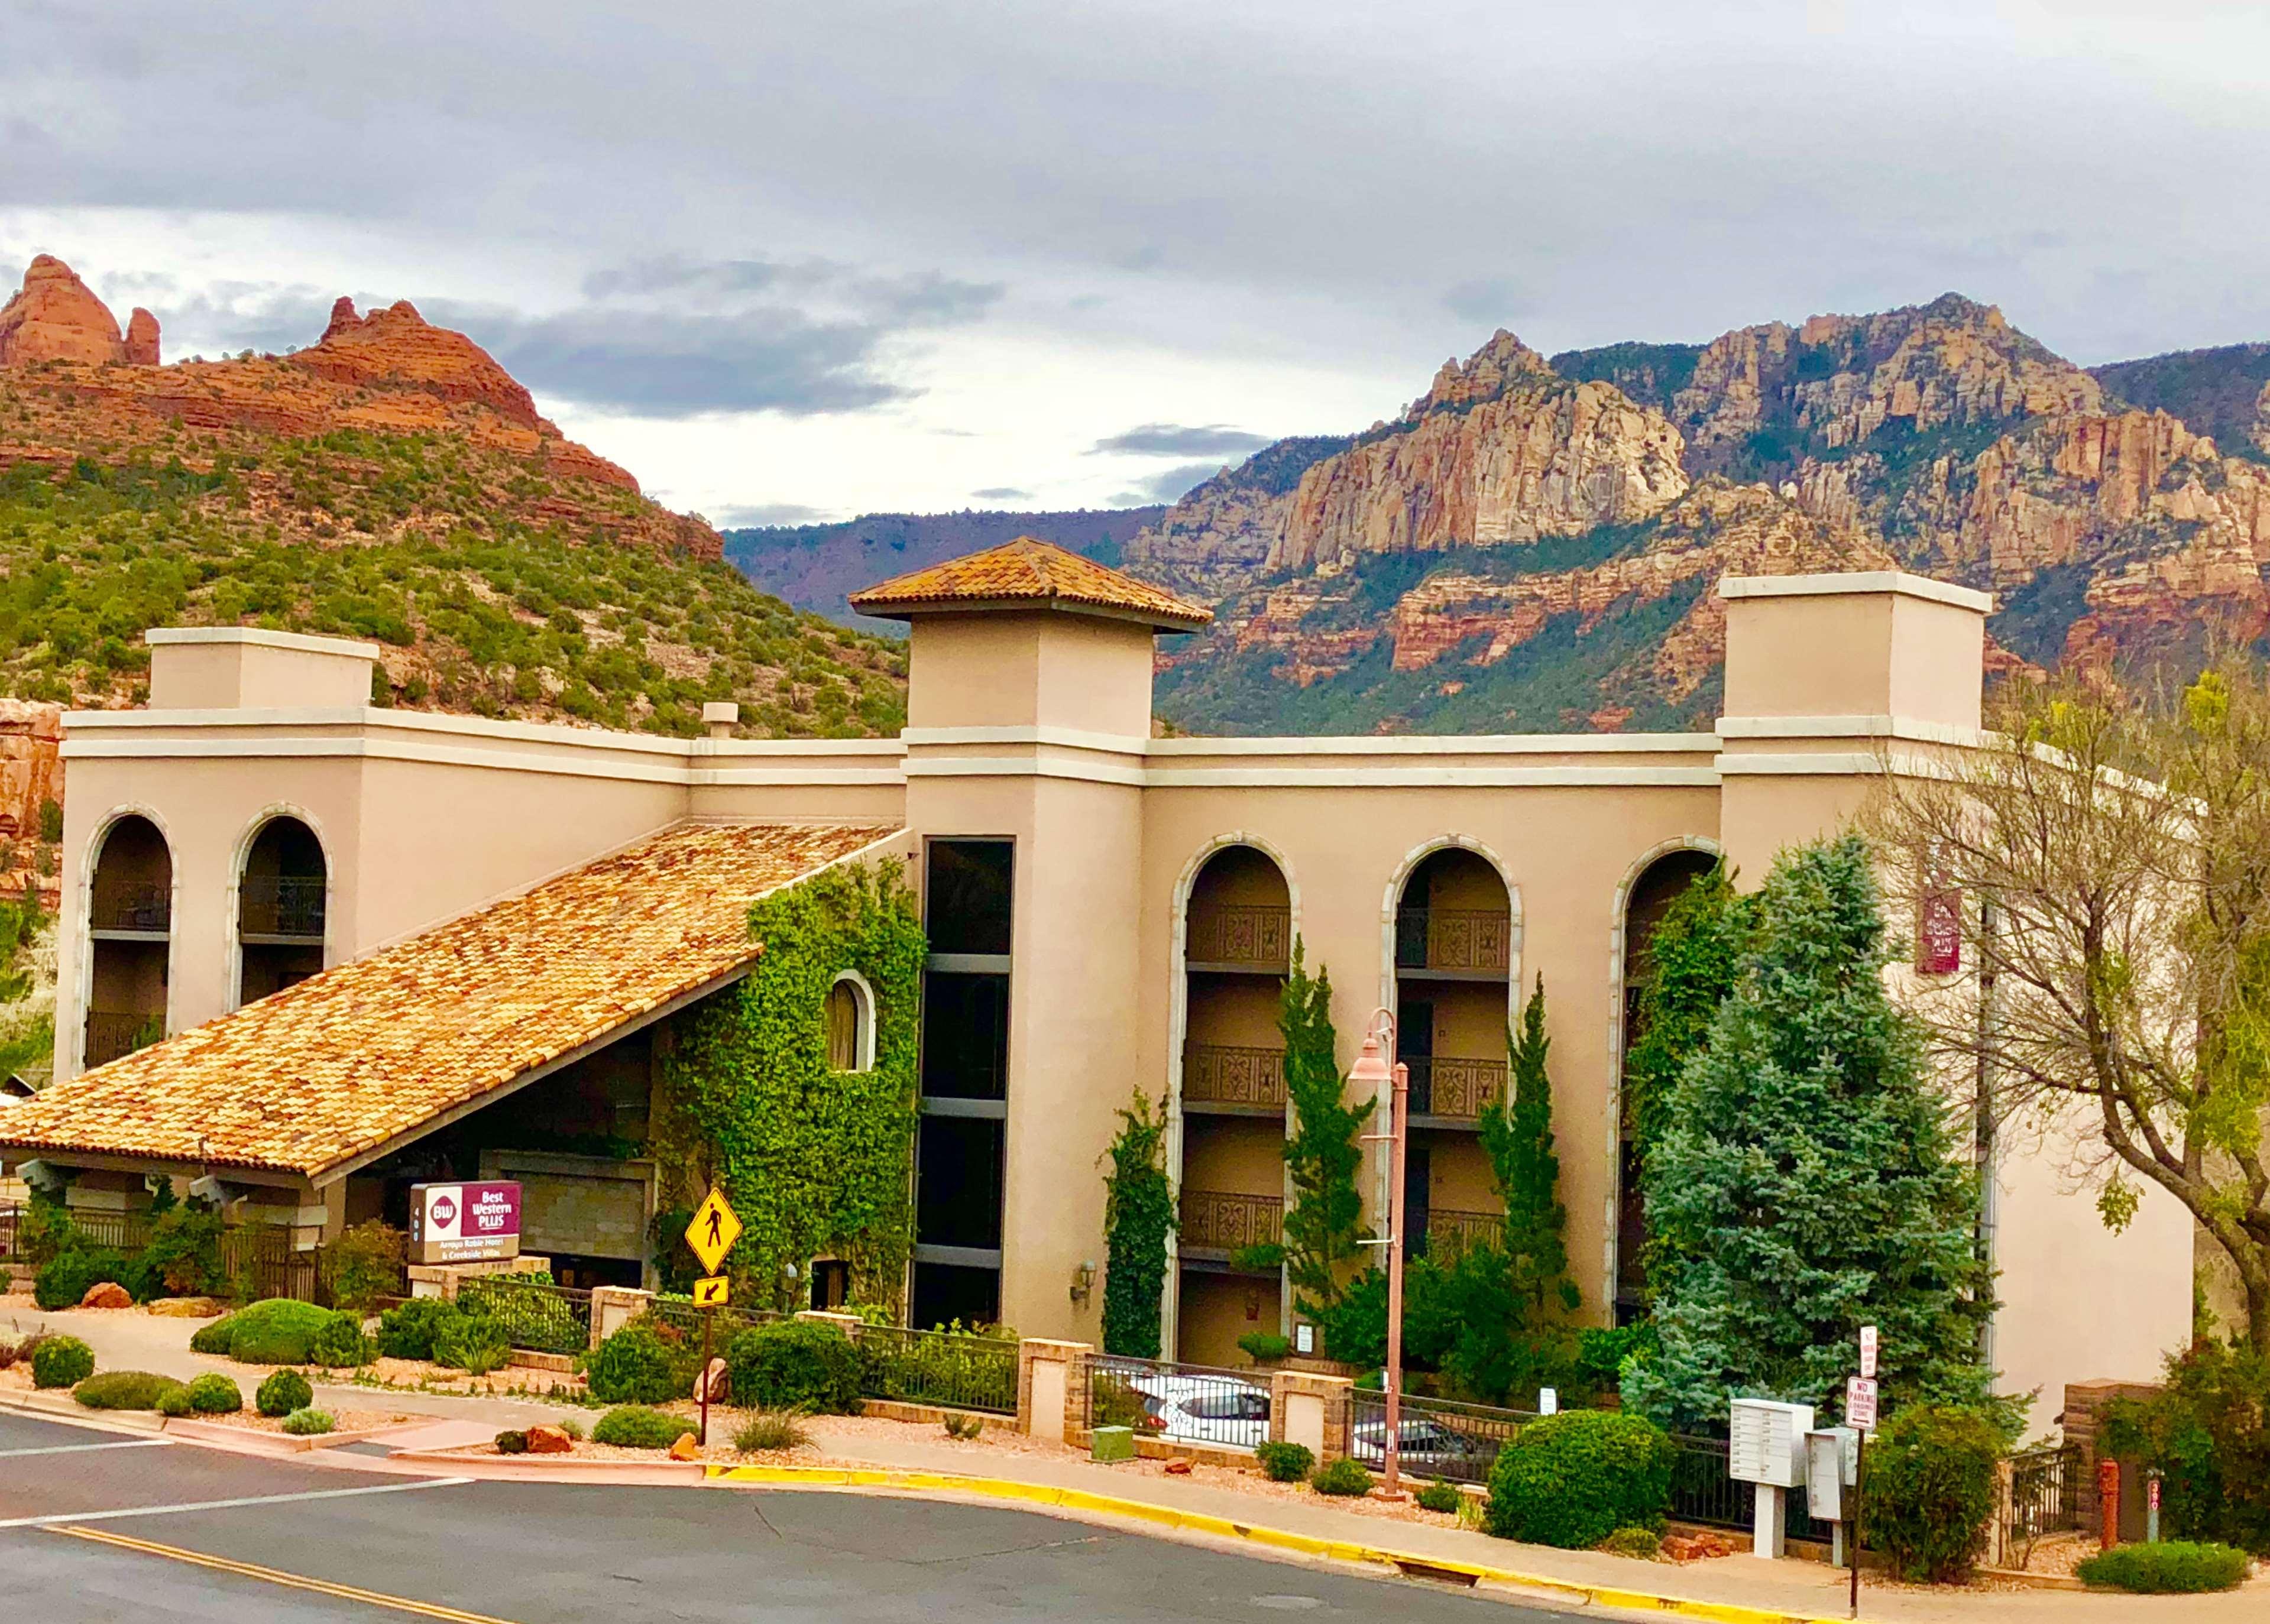 Best Western Plus Arroyo Roble Hotel & Creekside Villas image 0